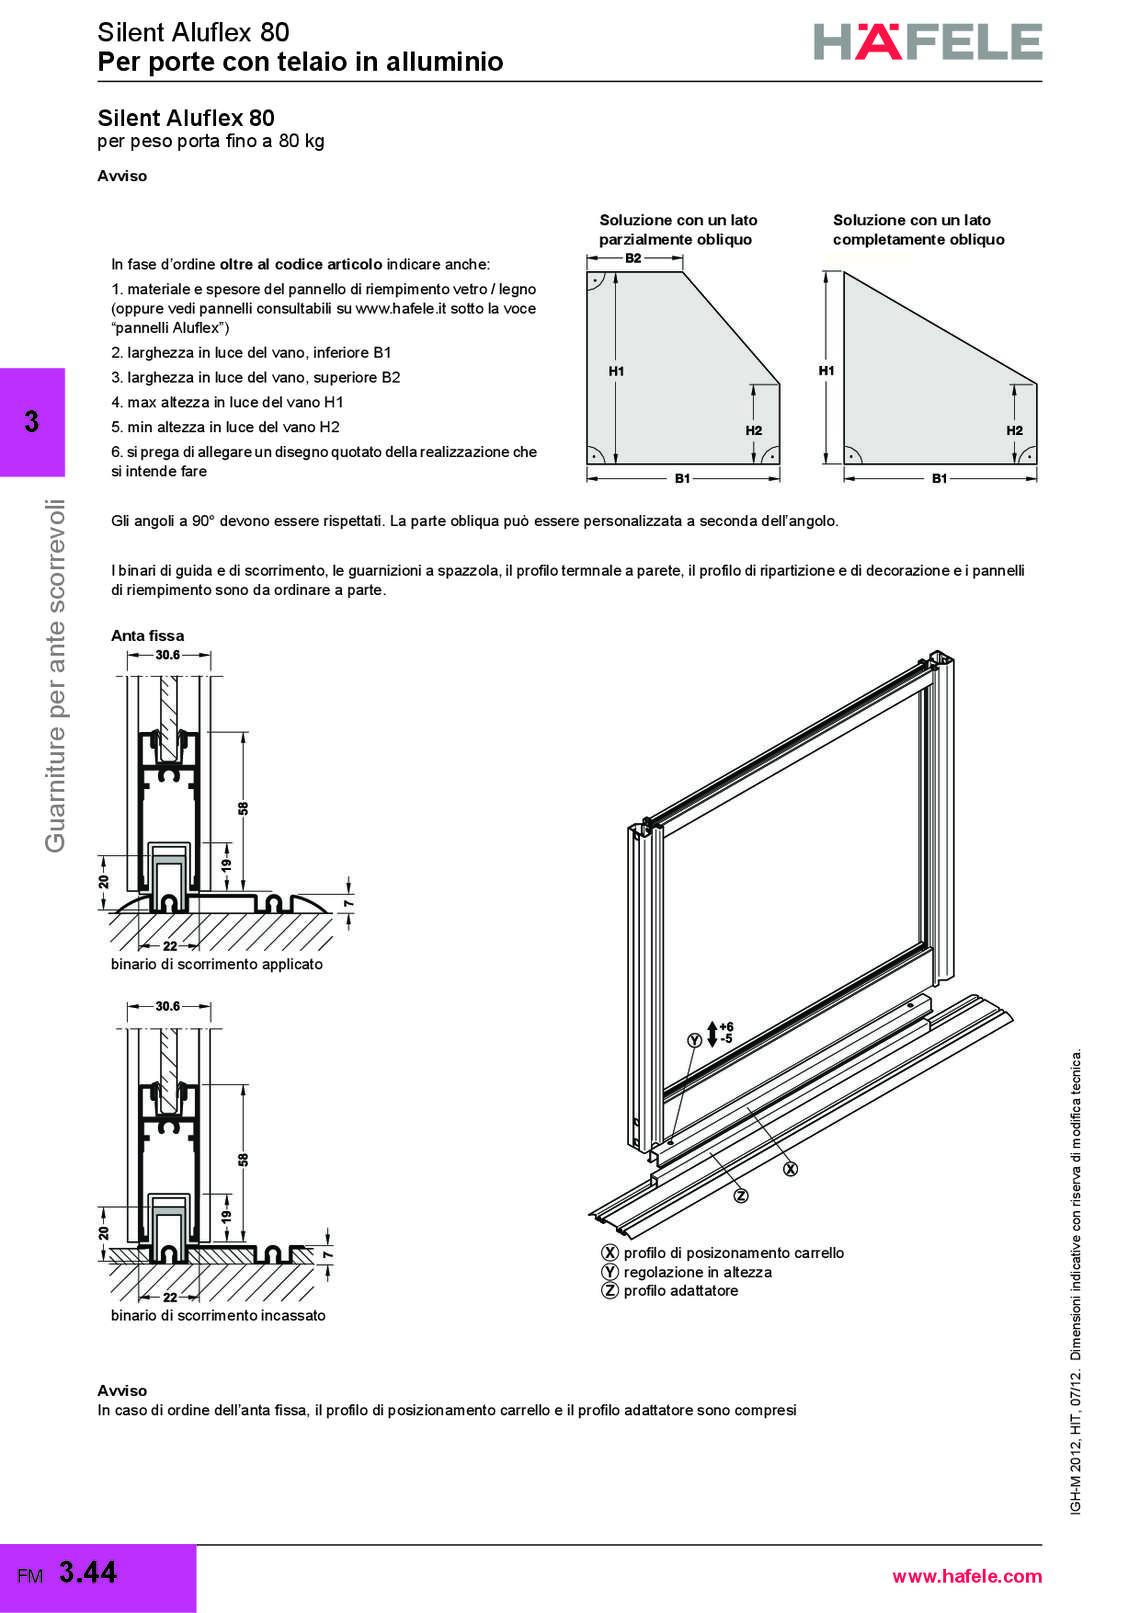 hafele-prodotti-su-misura_81_057.jpg